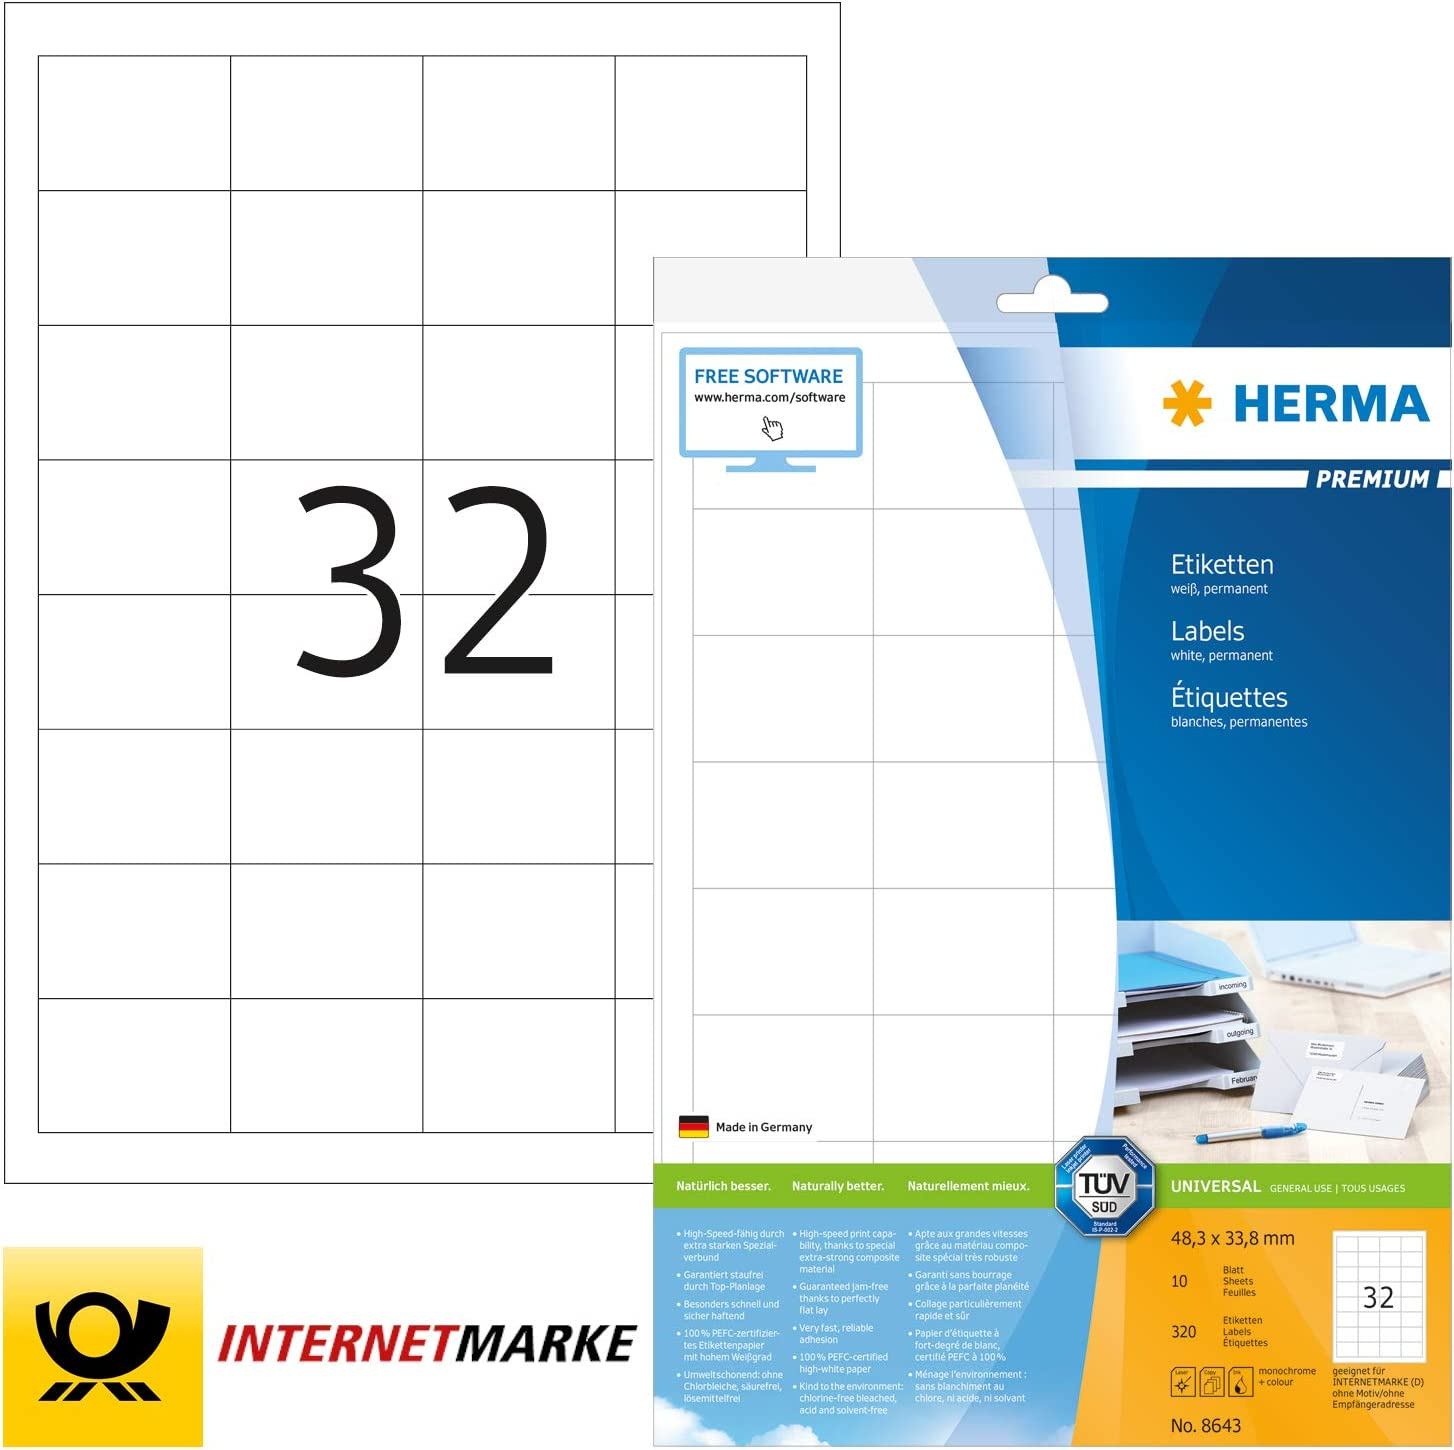 bedruckbar 48,3 x 33,8 mm Herma 8643 Universal Etiketten selbstklebend 10 Blatt Premium DIN A4 Papier matt 320 Klebeetiketten wei/ß